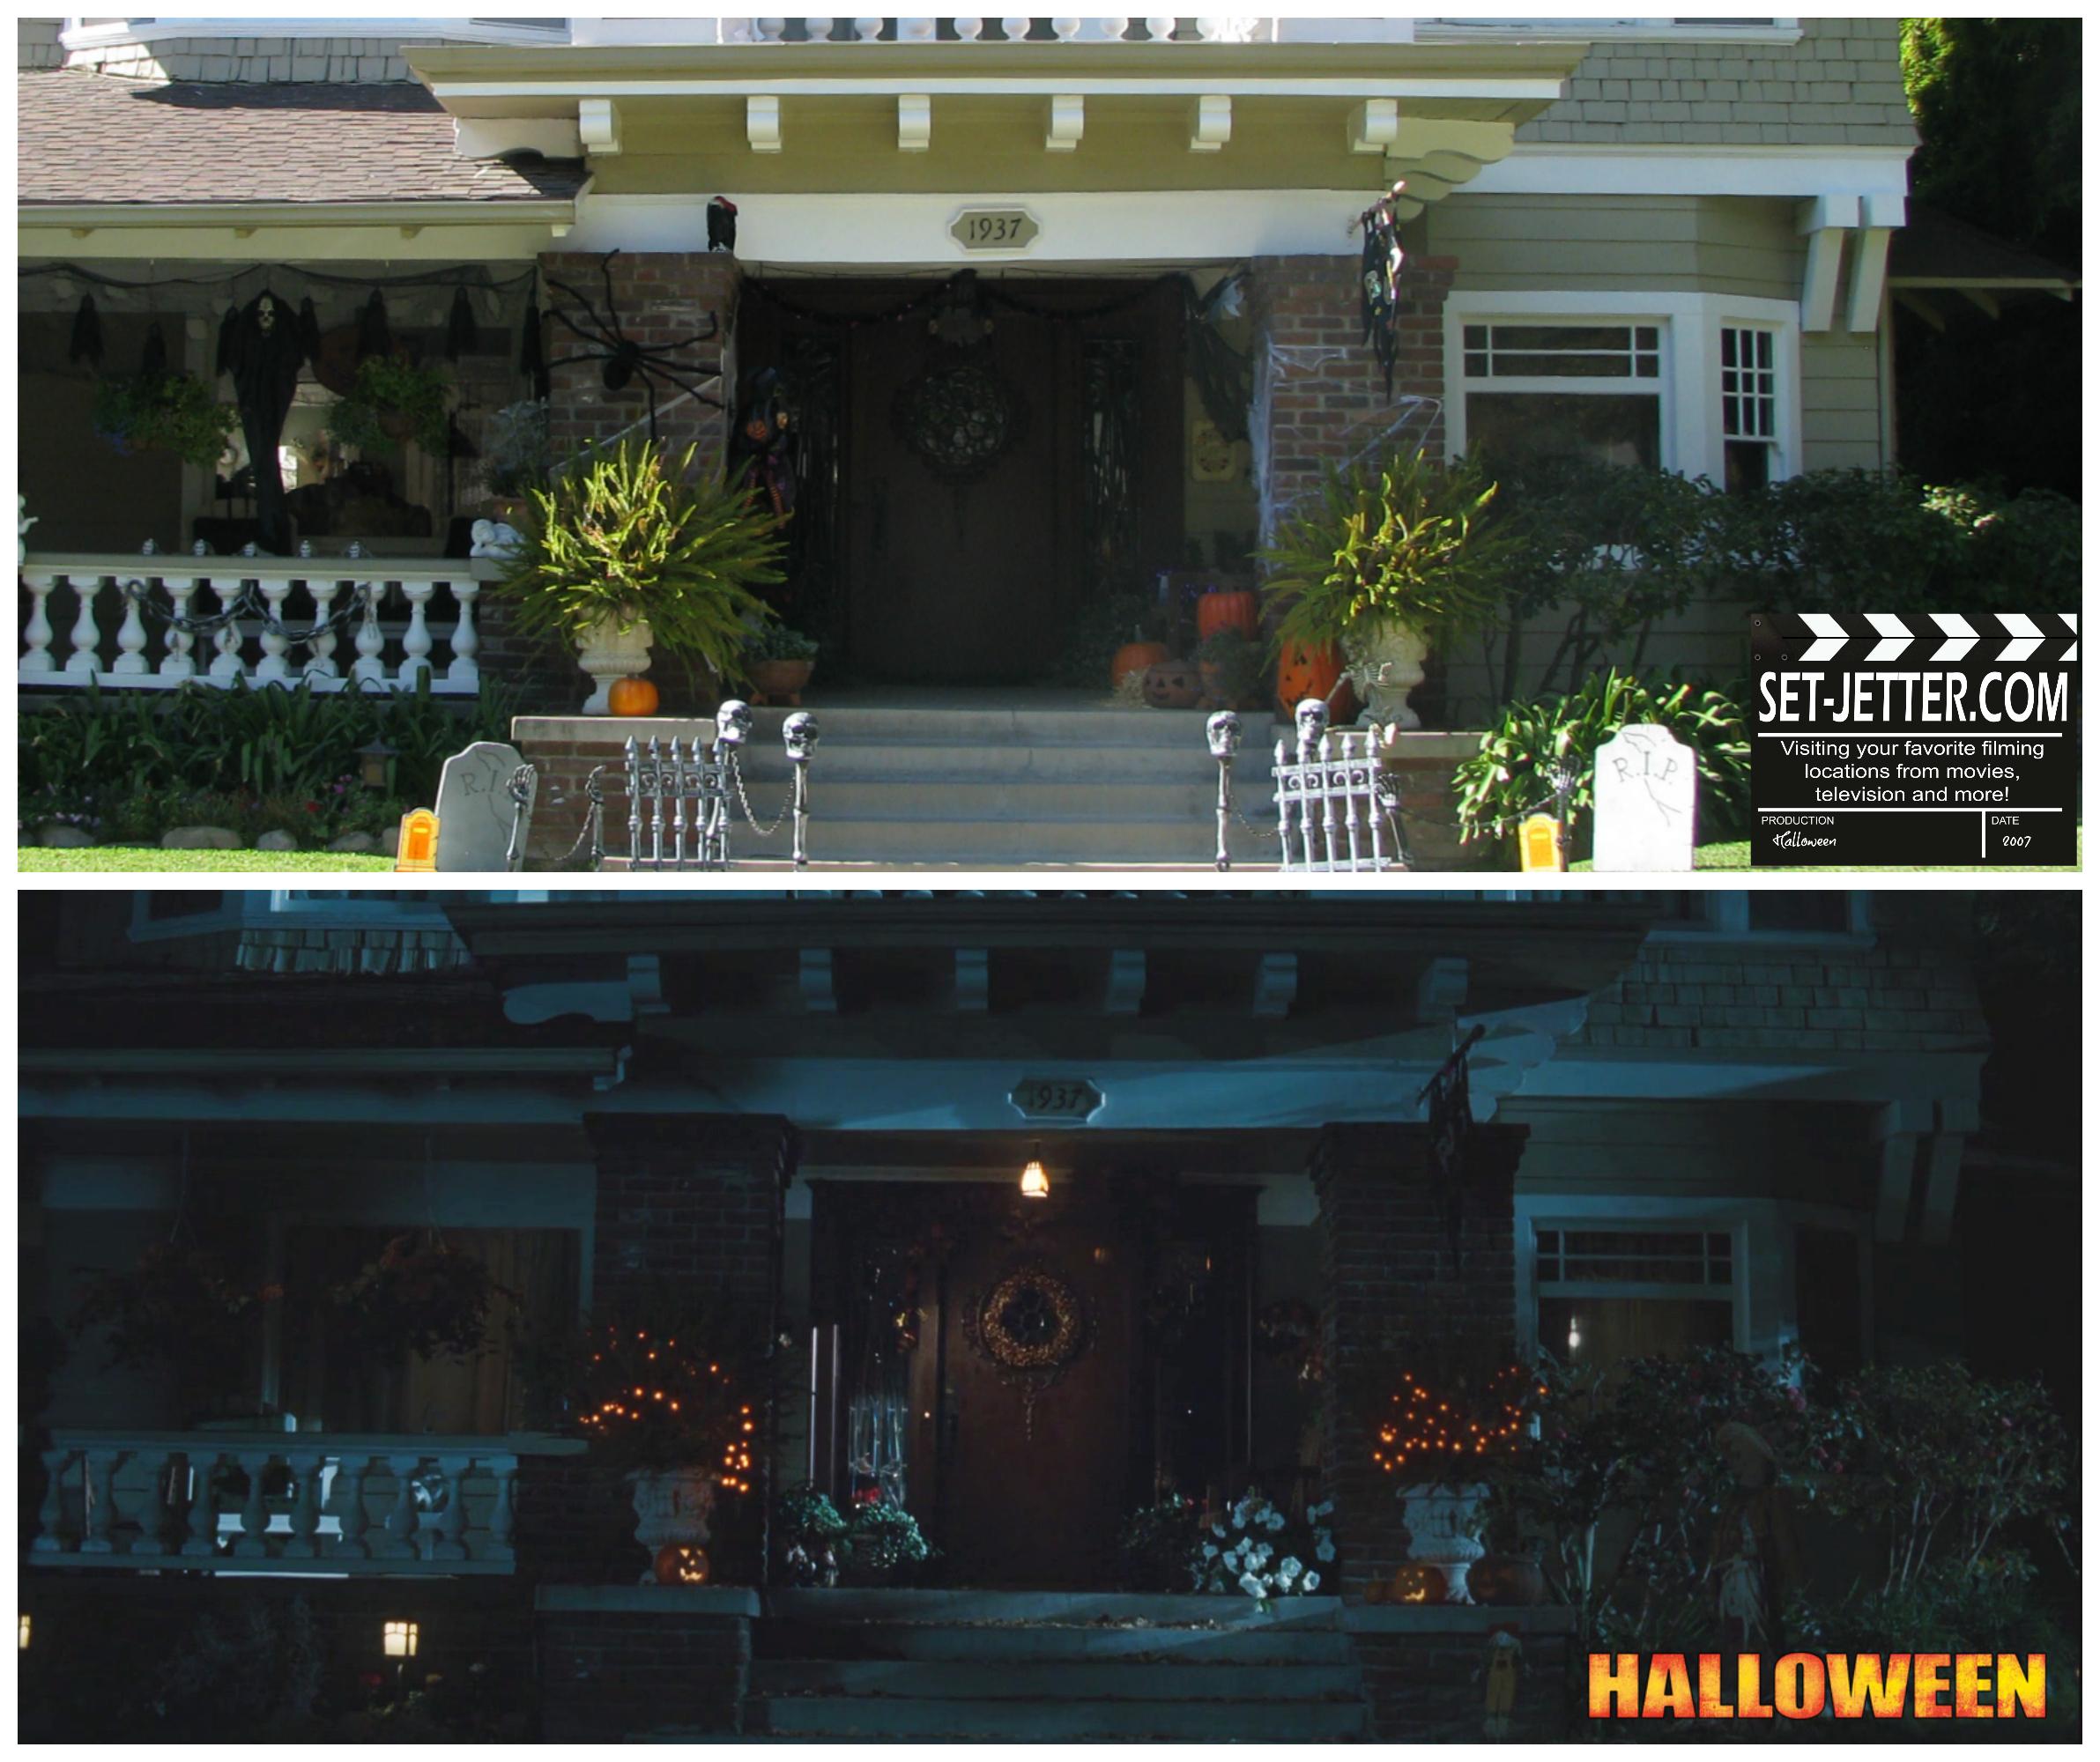 Halloween 2007 comparison 61.jpg